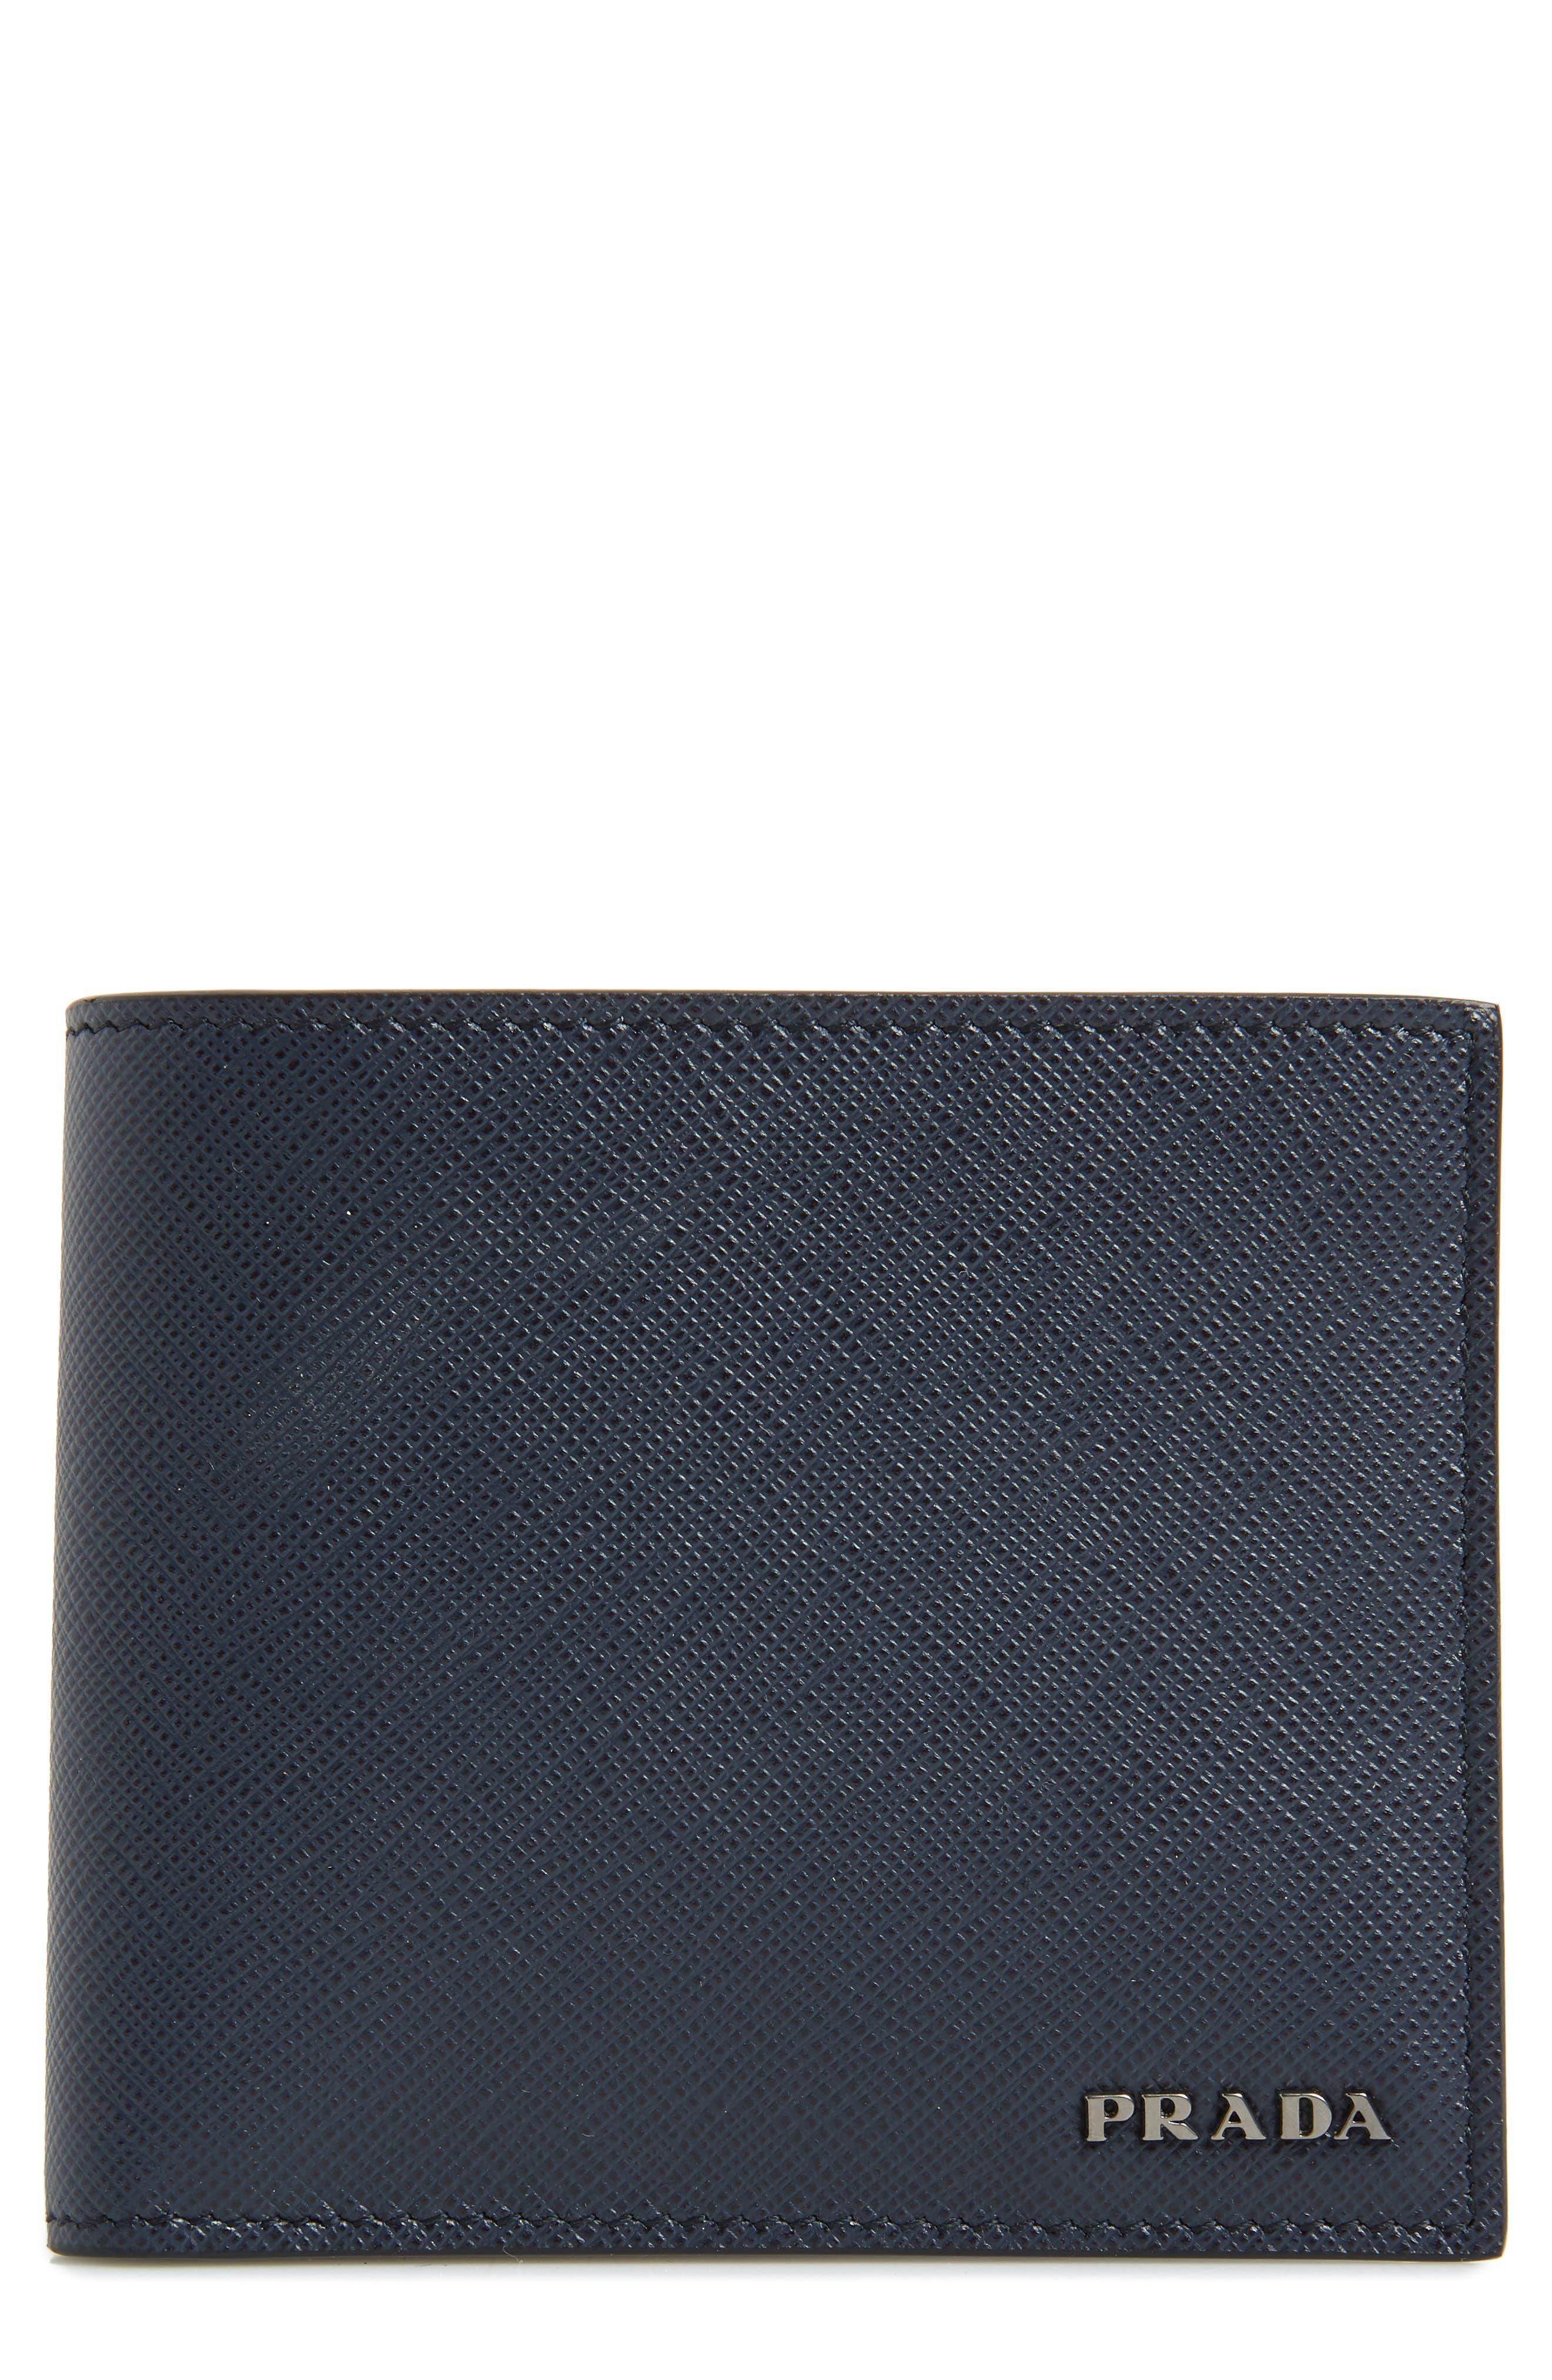 Bicolor Leather Wallet,                         Main,                         color, Baltico+Ot